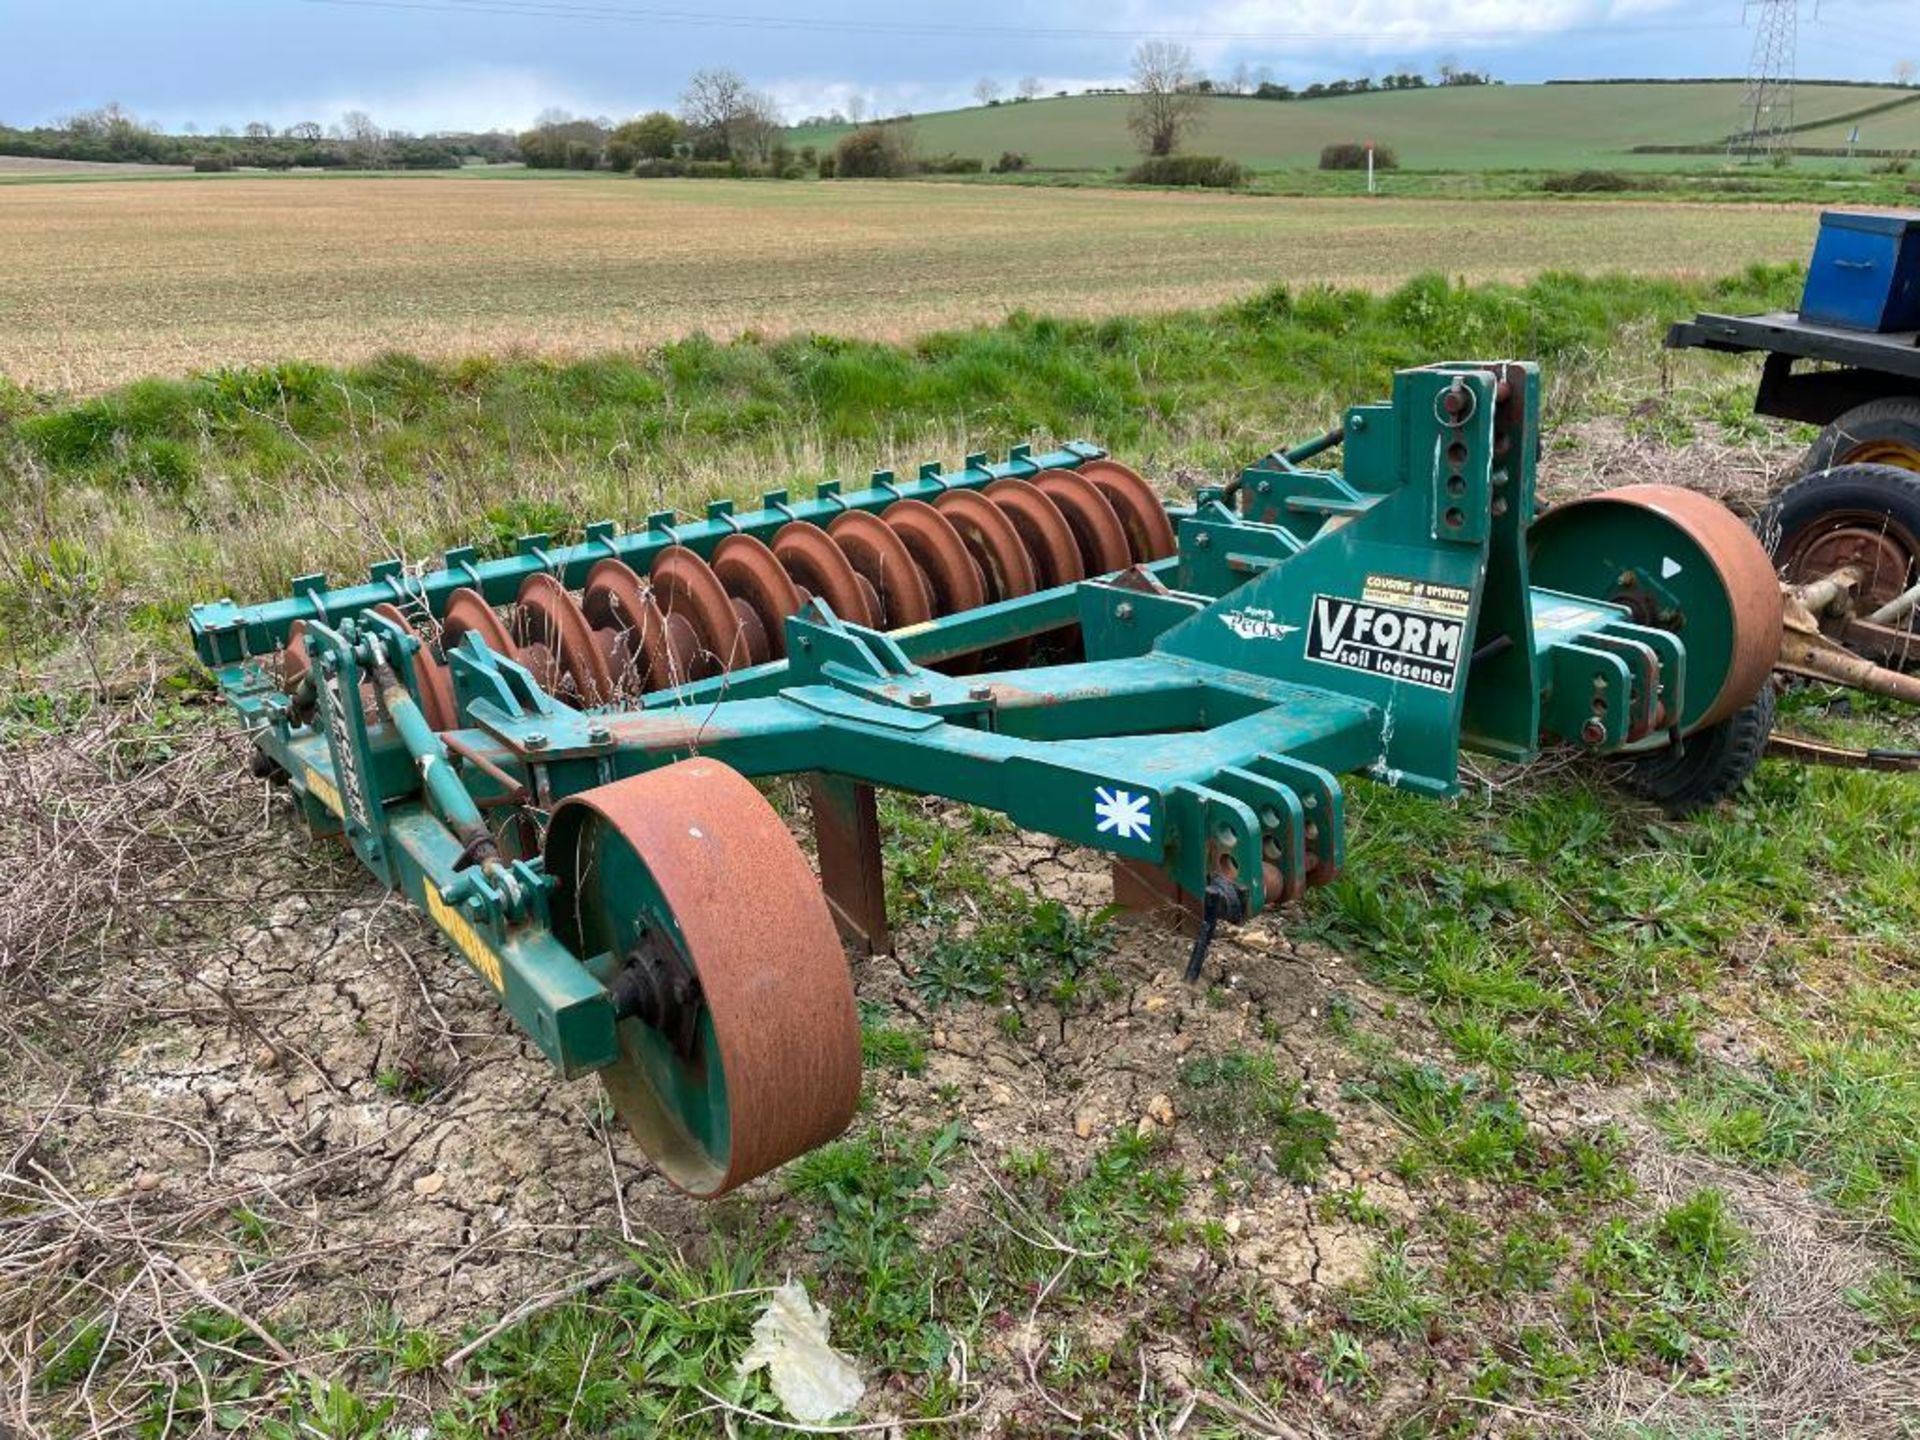 2004 Cousins V Form 3m 5 leg soil loosener with rear packer. Serial No: 2004101 - Image 6 of 7